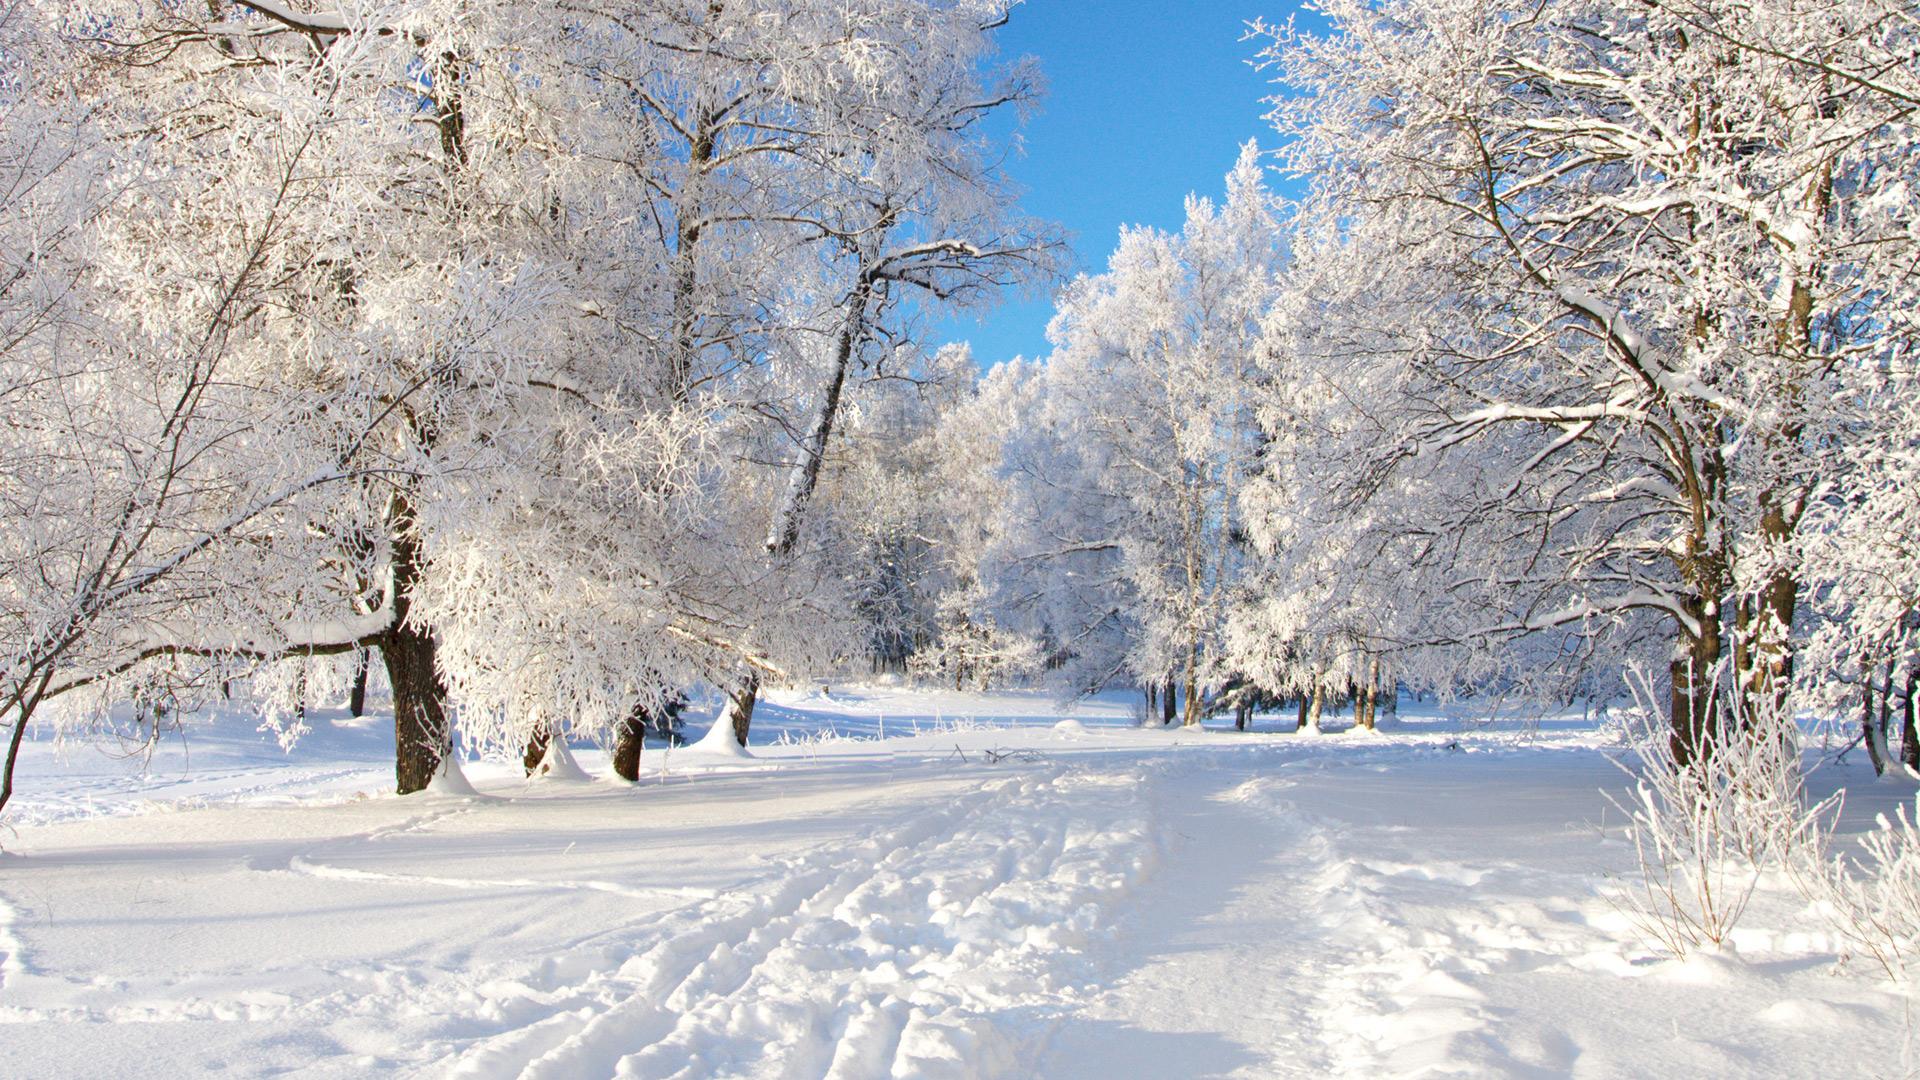 Скачати безплатно фото зими 27 фотография